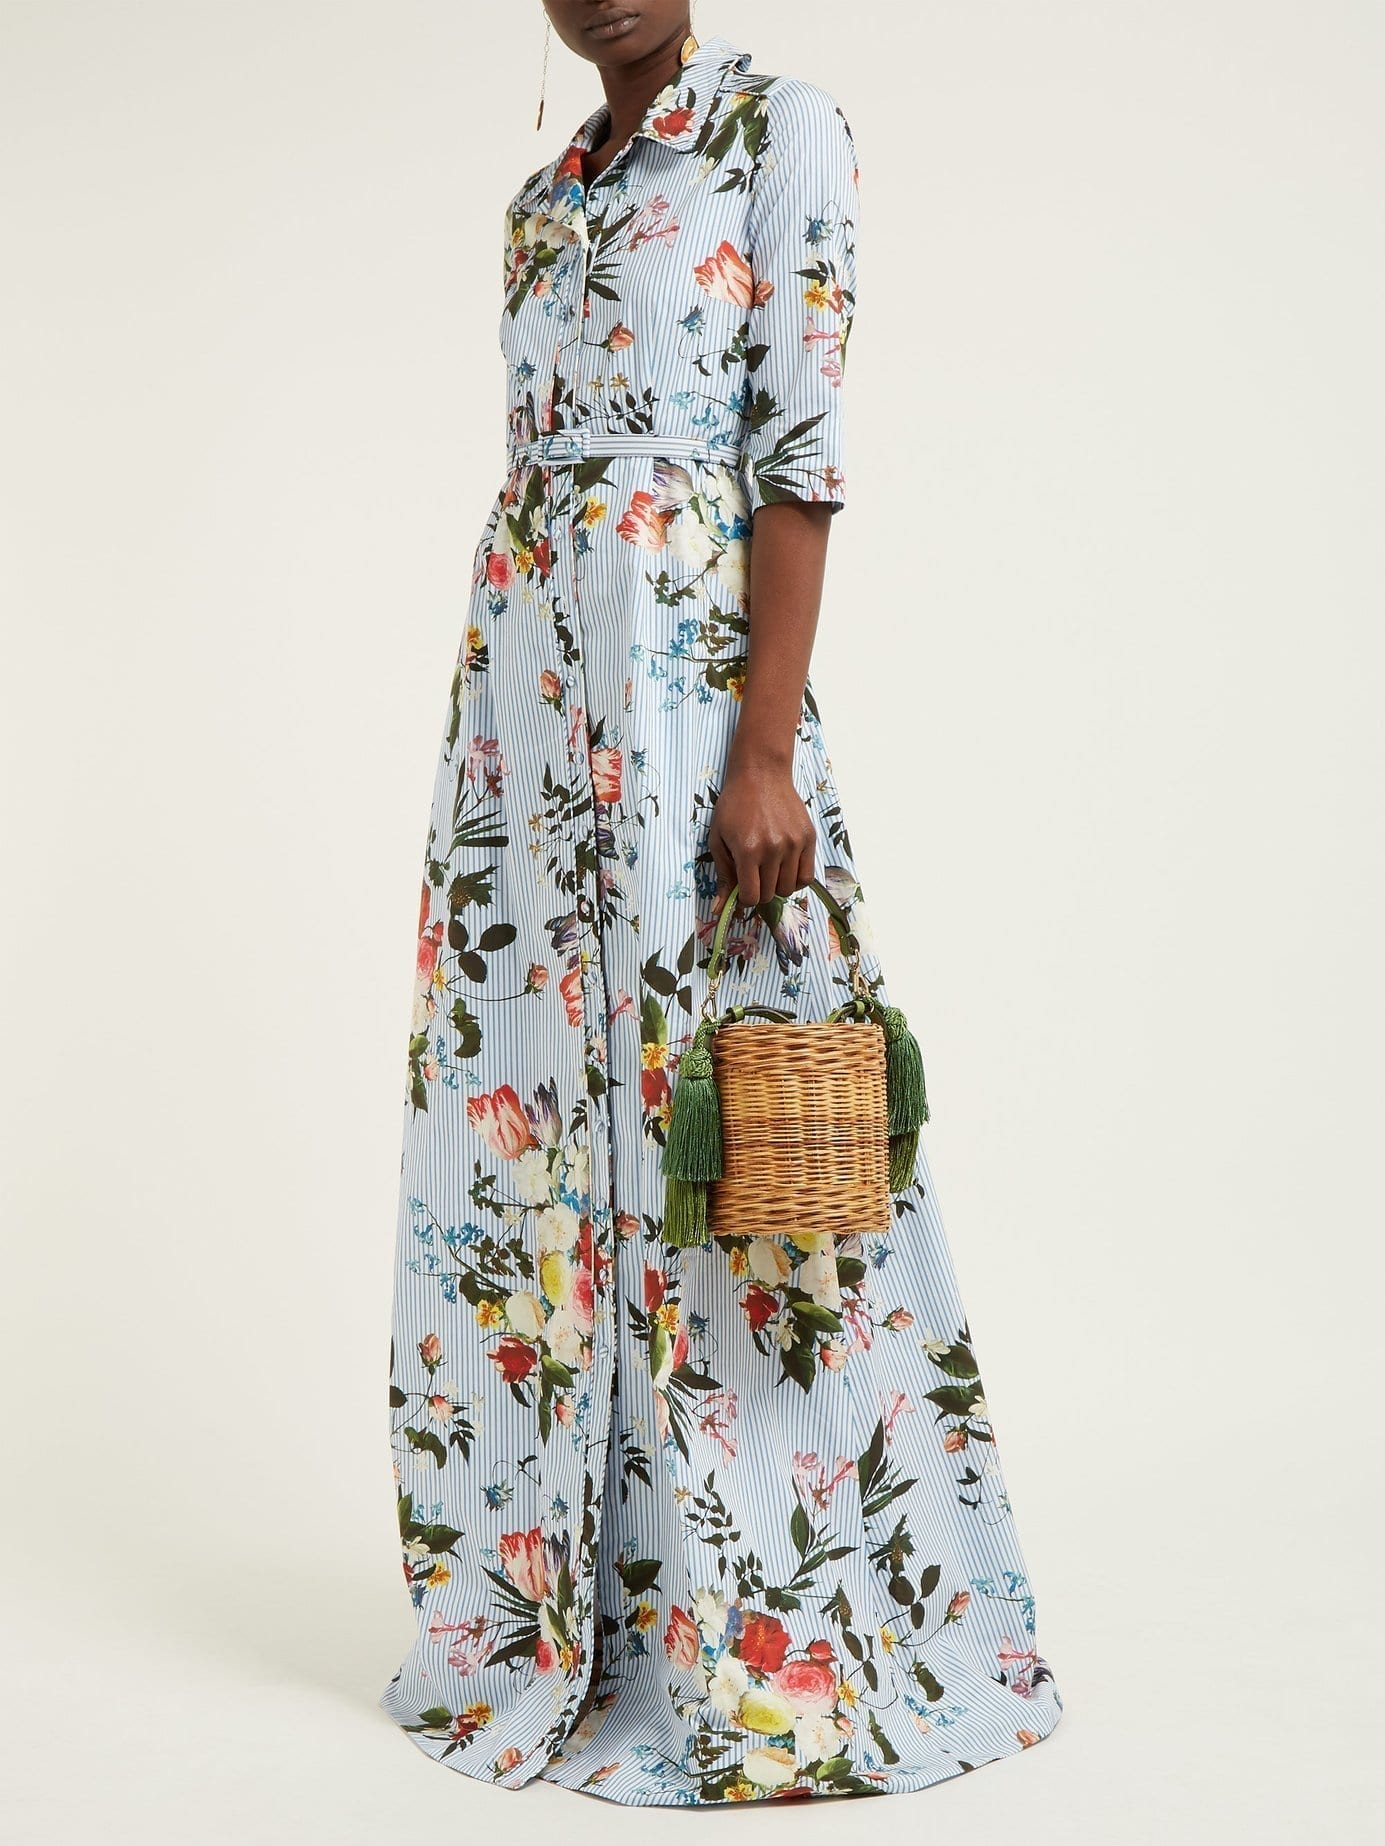 ERDEM Karissa Striped Cotton Shirt Blue / Floral Printed Dress